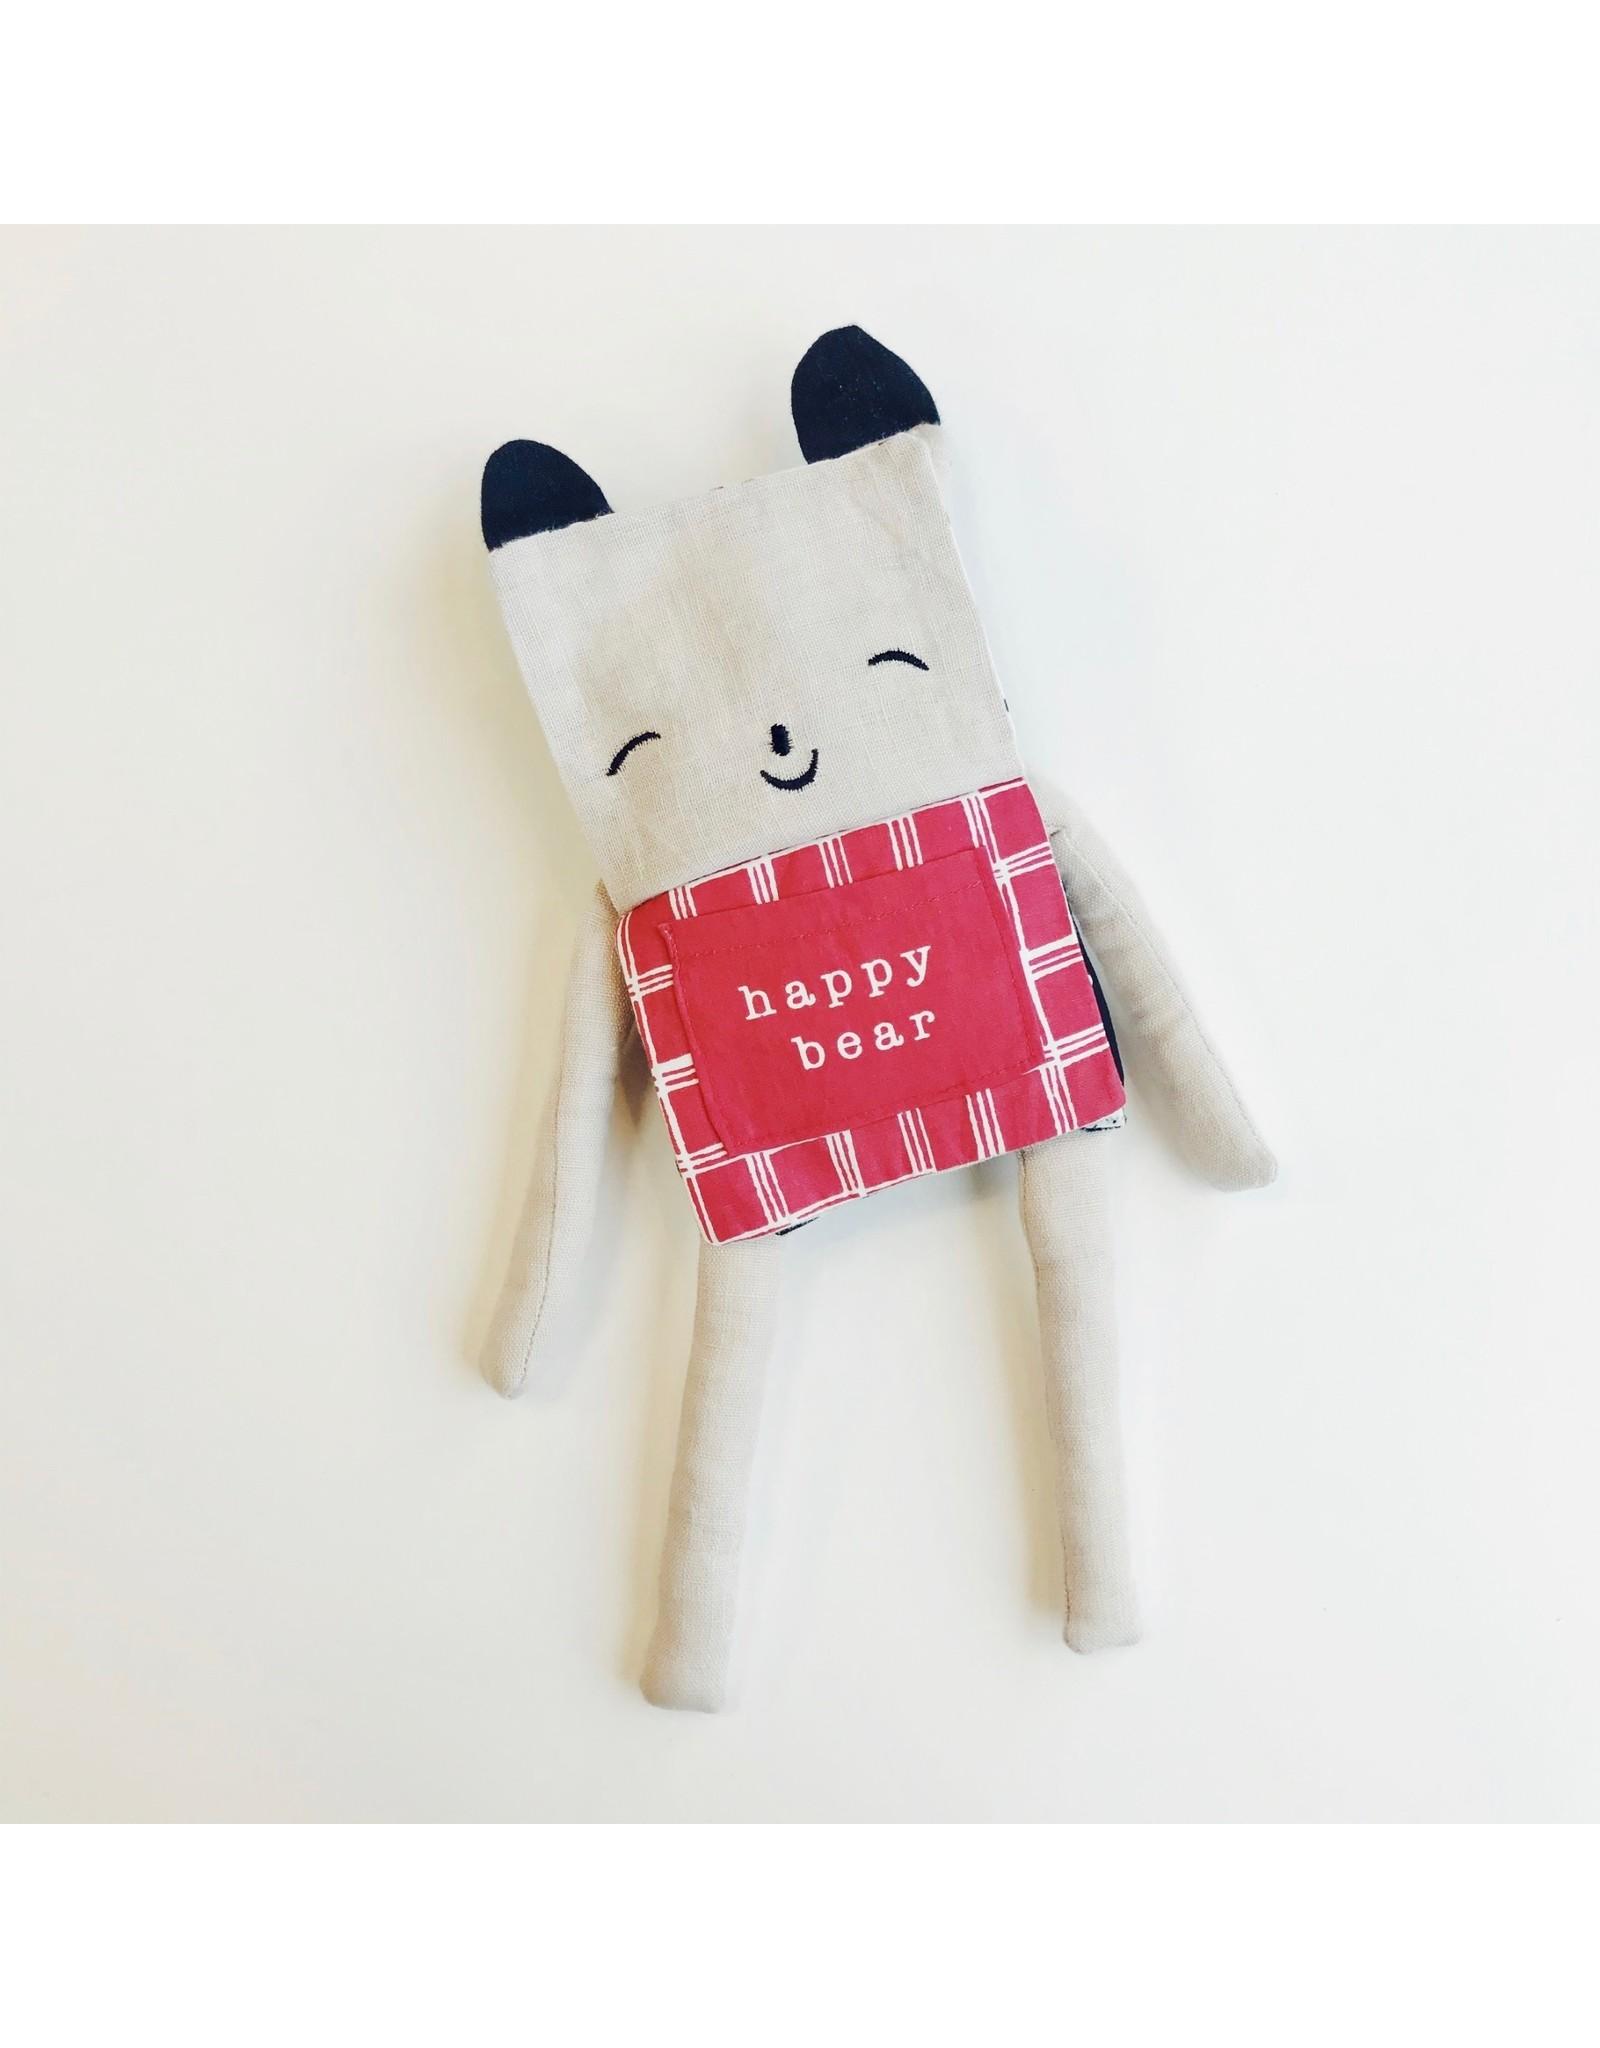 Flippy Friend Cuddly Toy